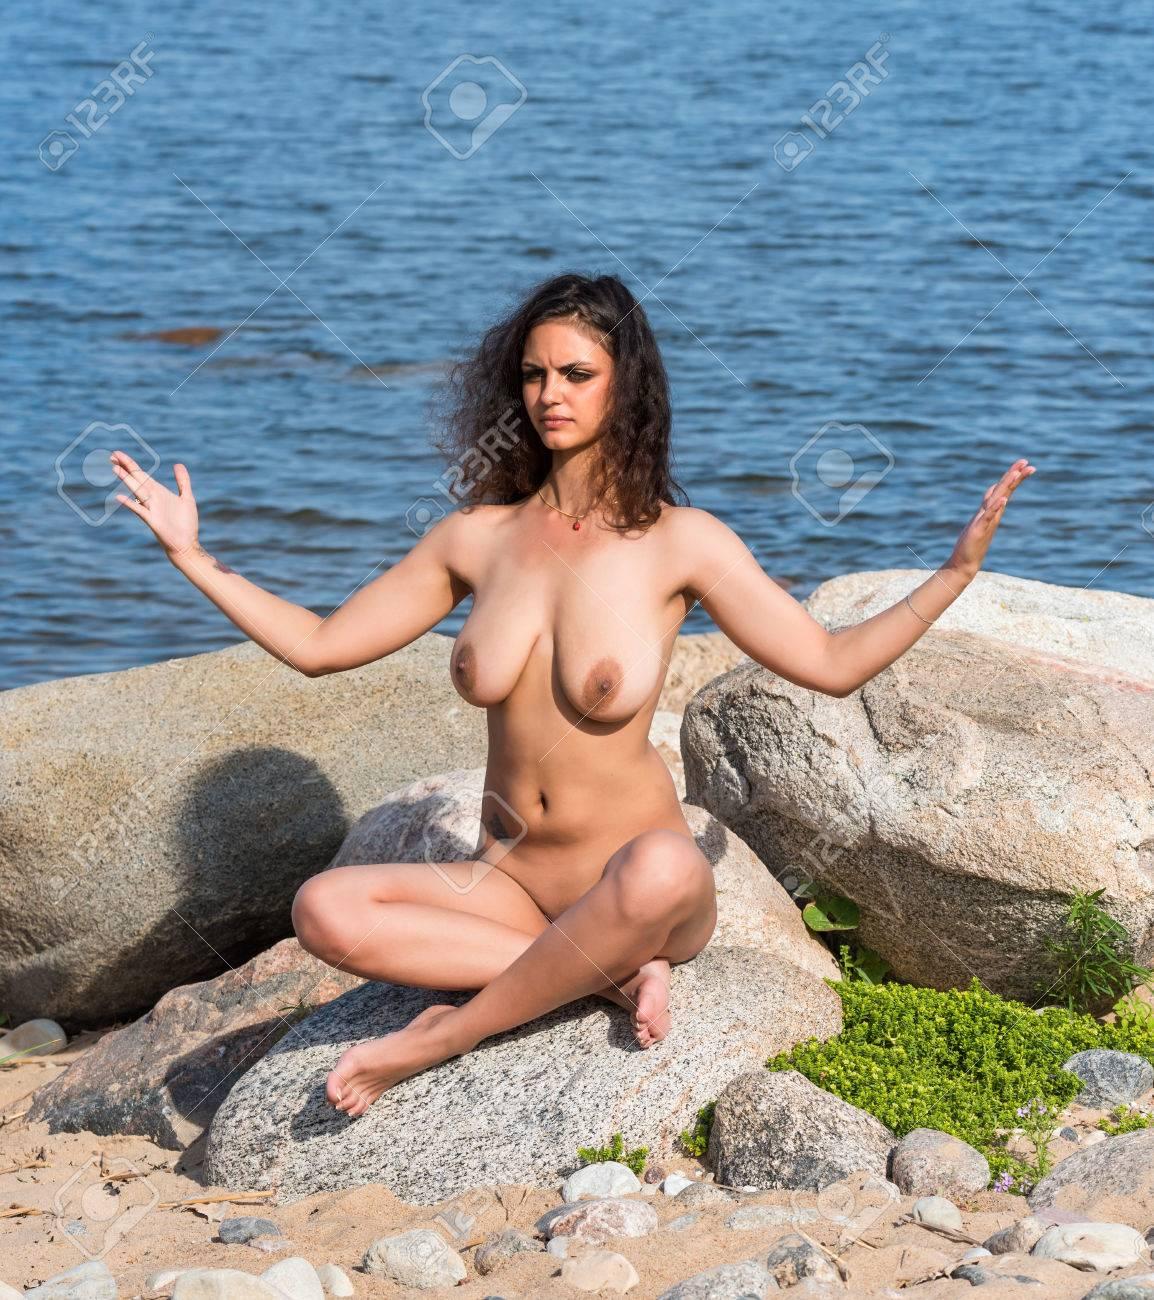 Nackt frau am strand